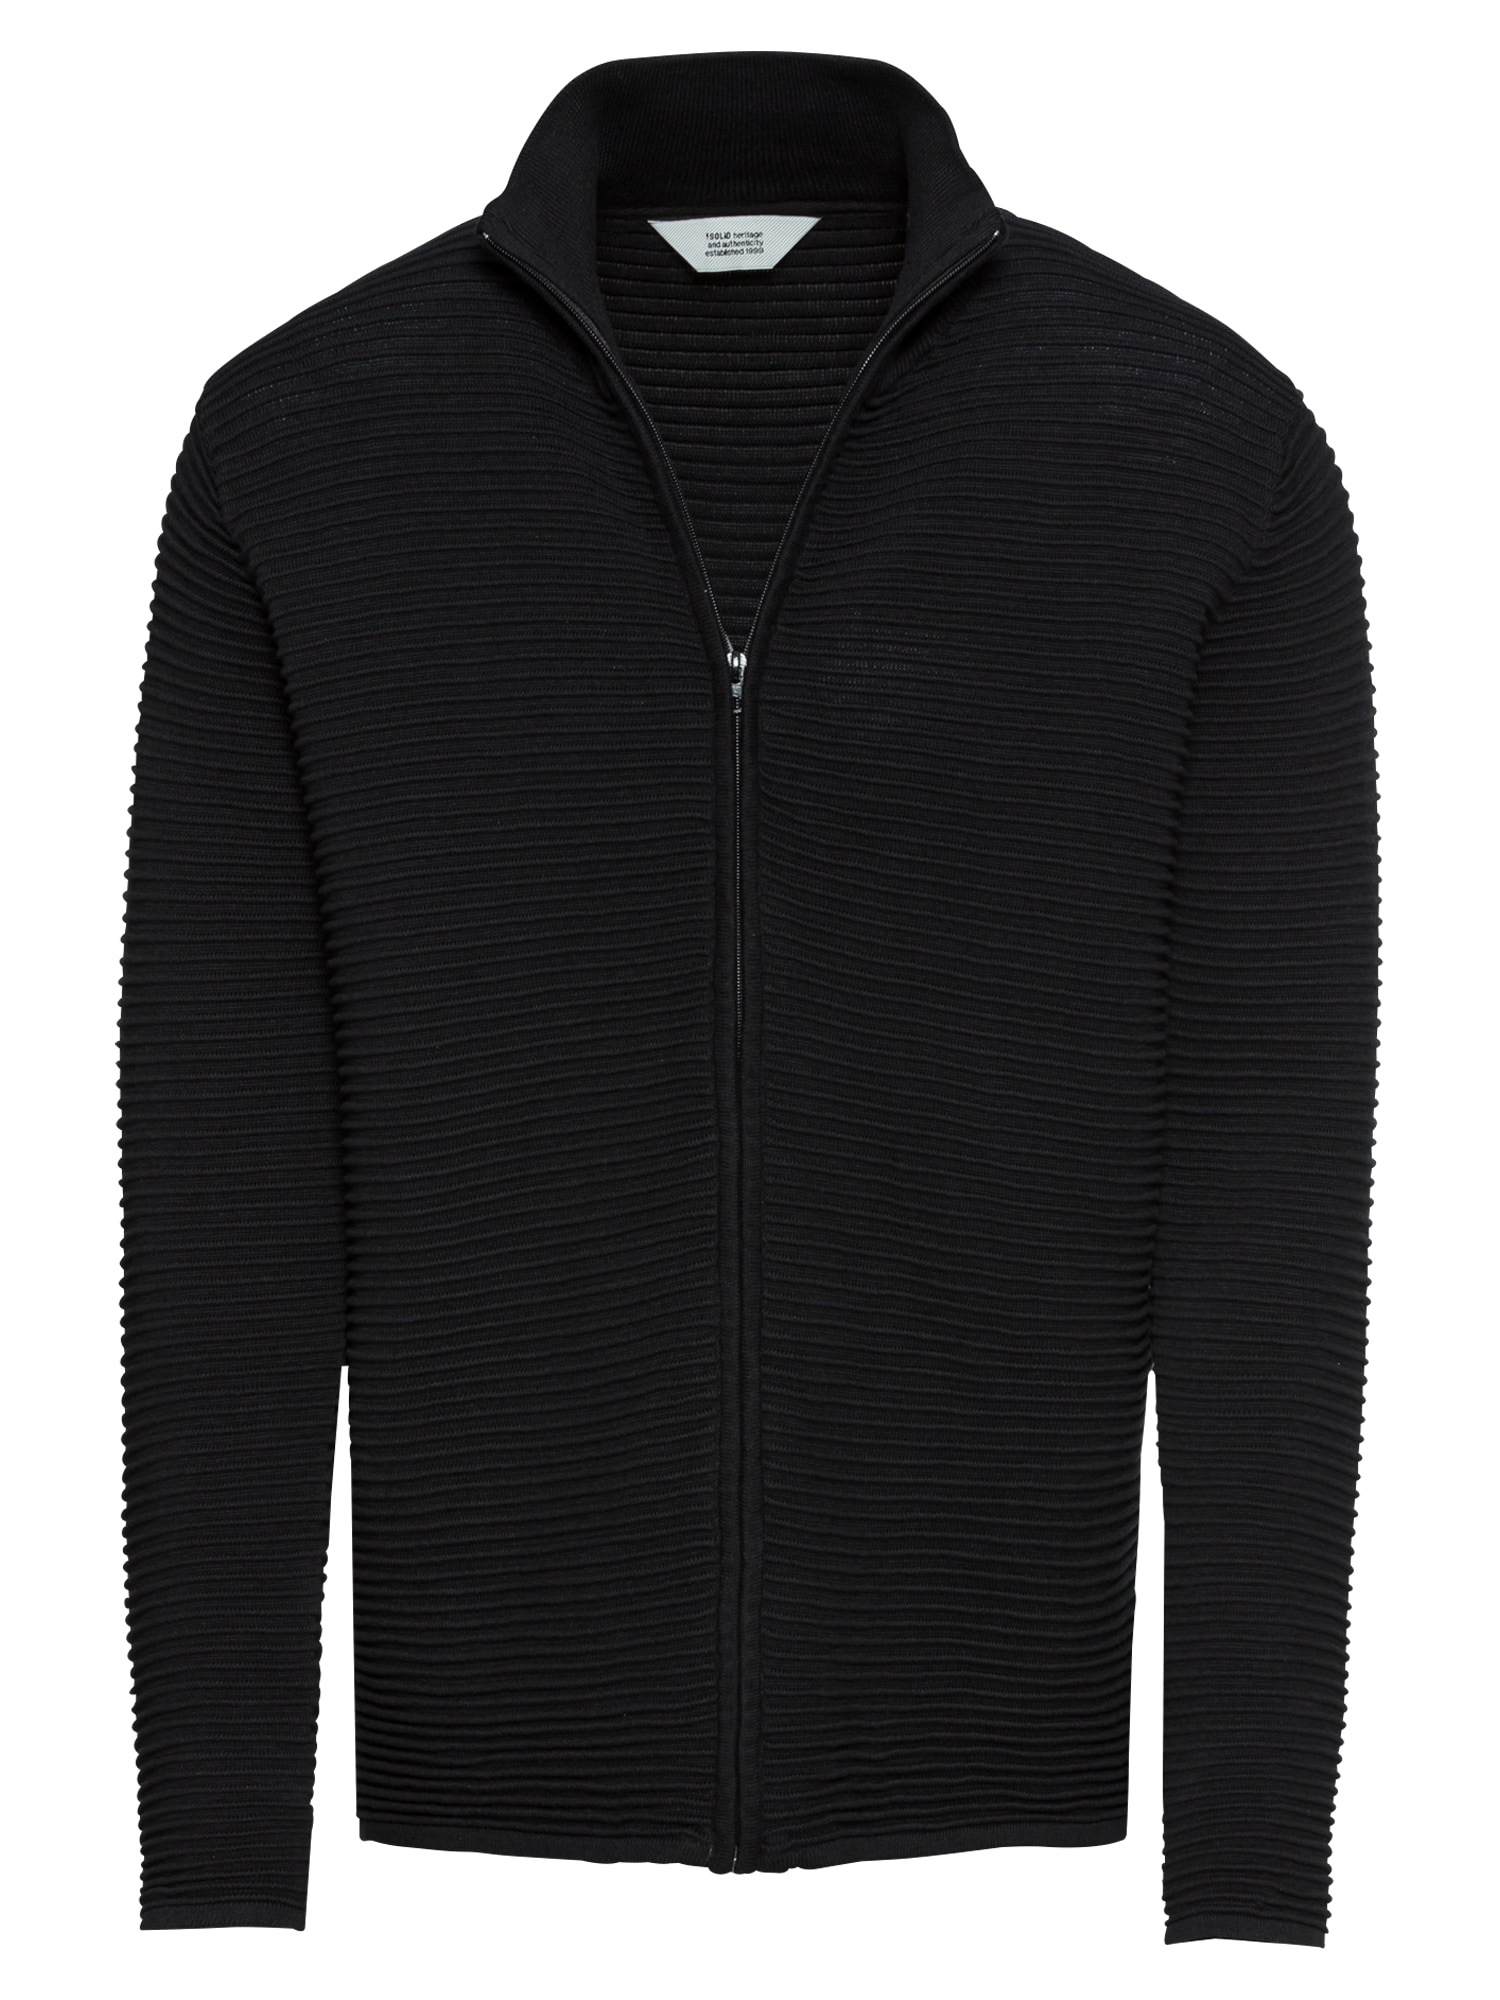 Kardigan Knit - Struan Zip černá !Solid